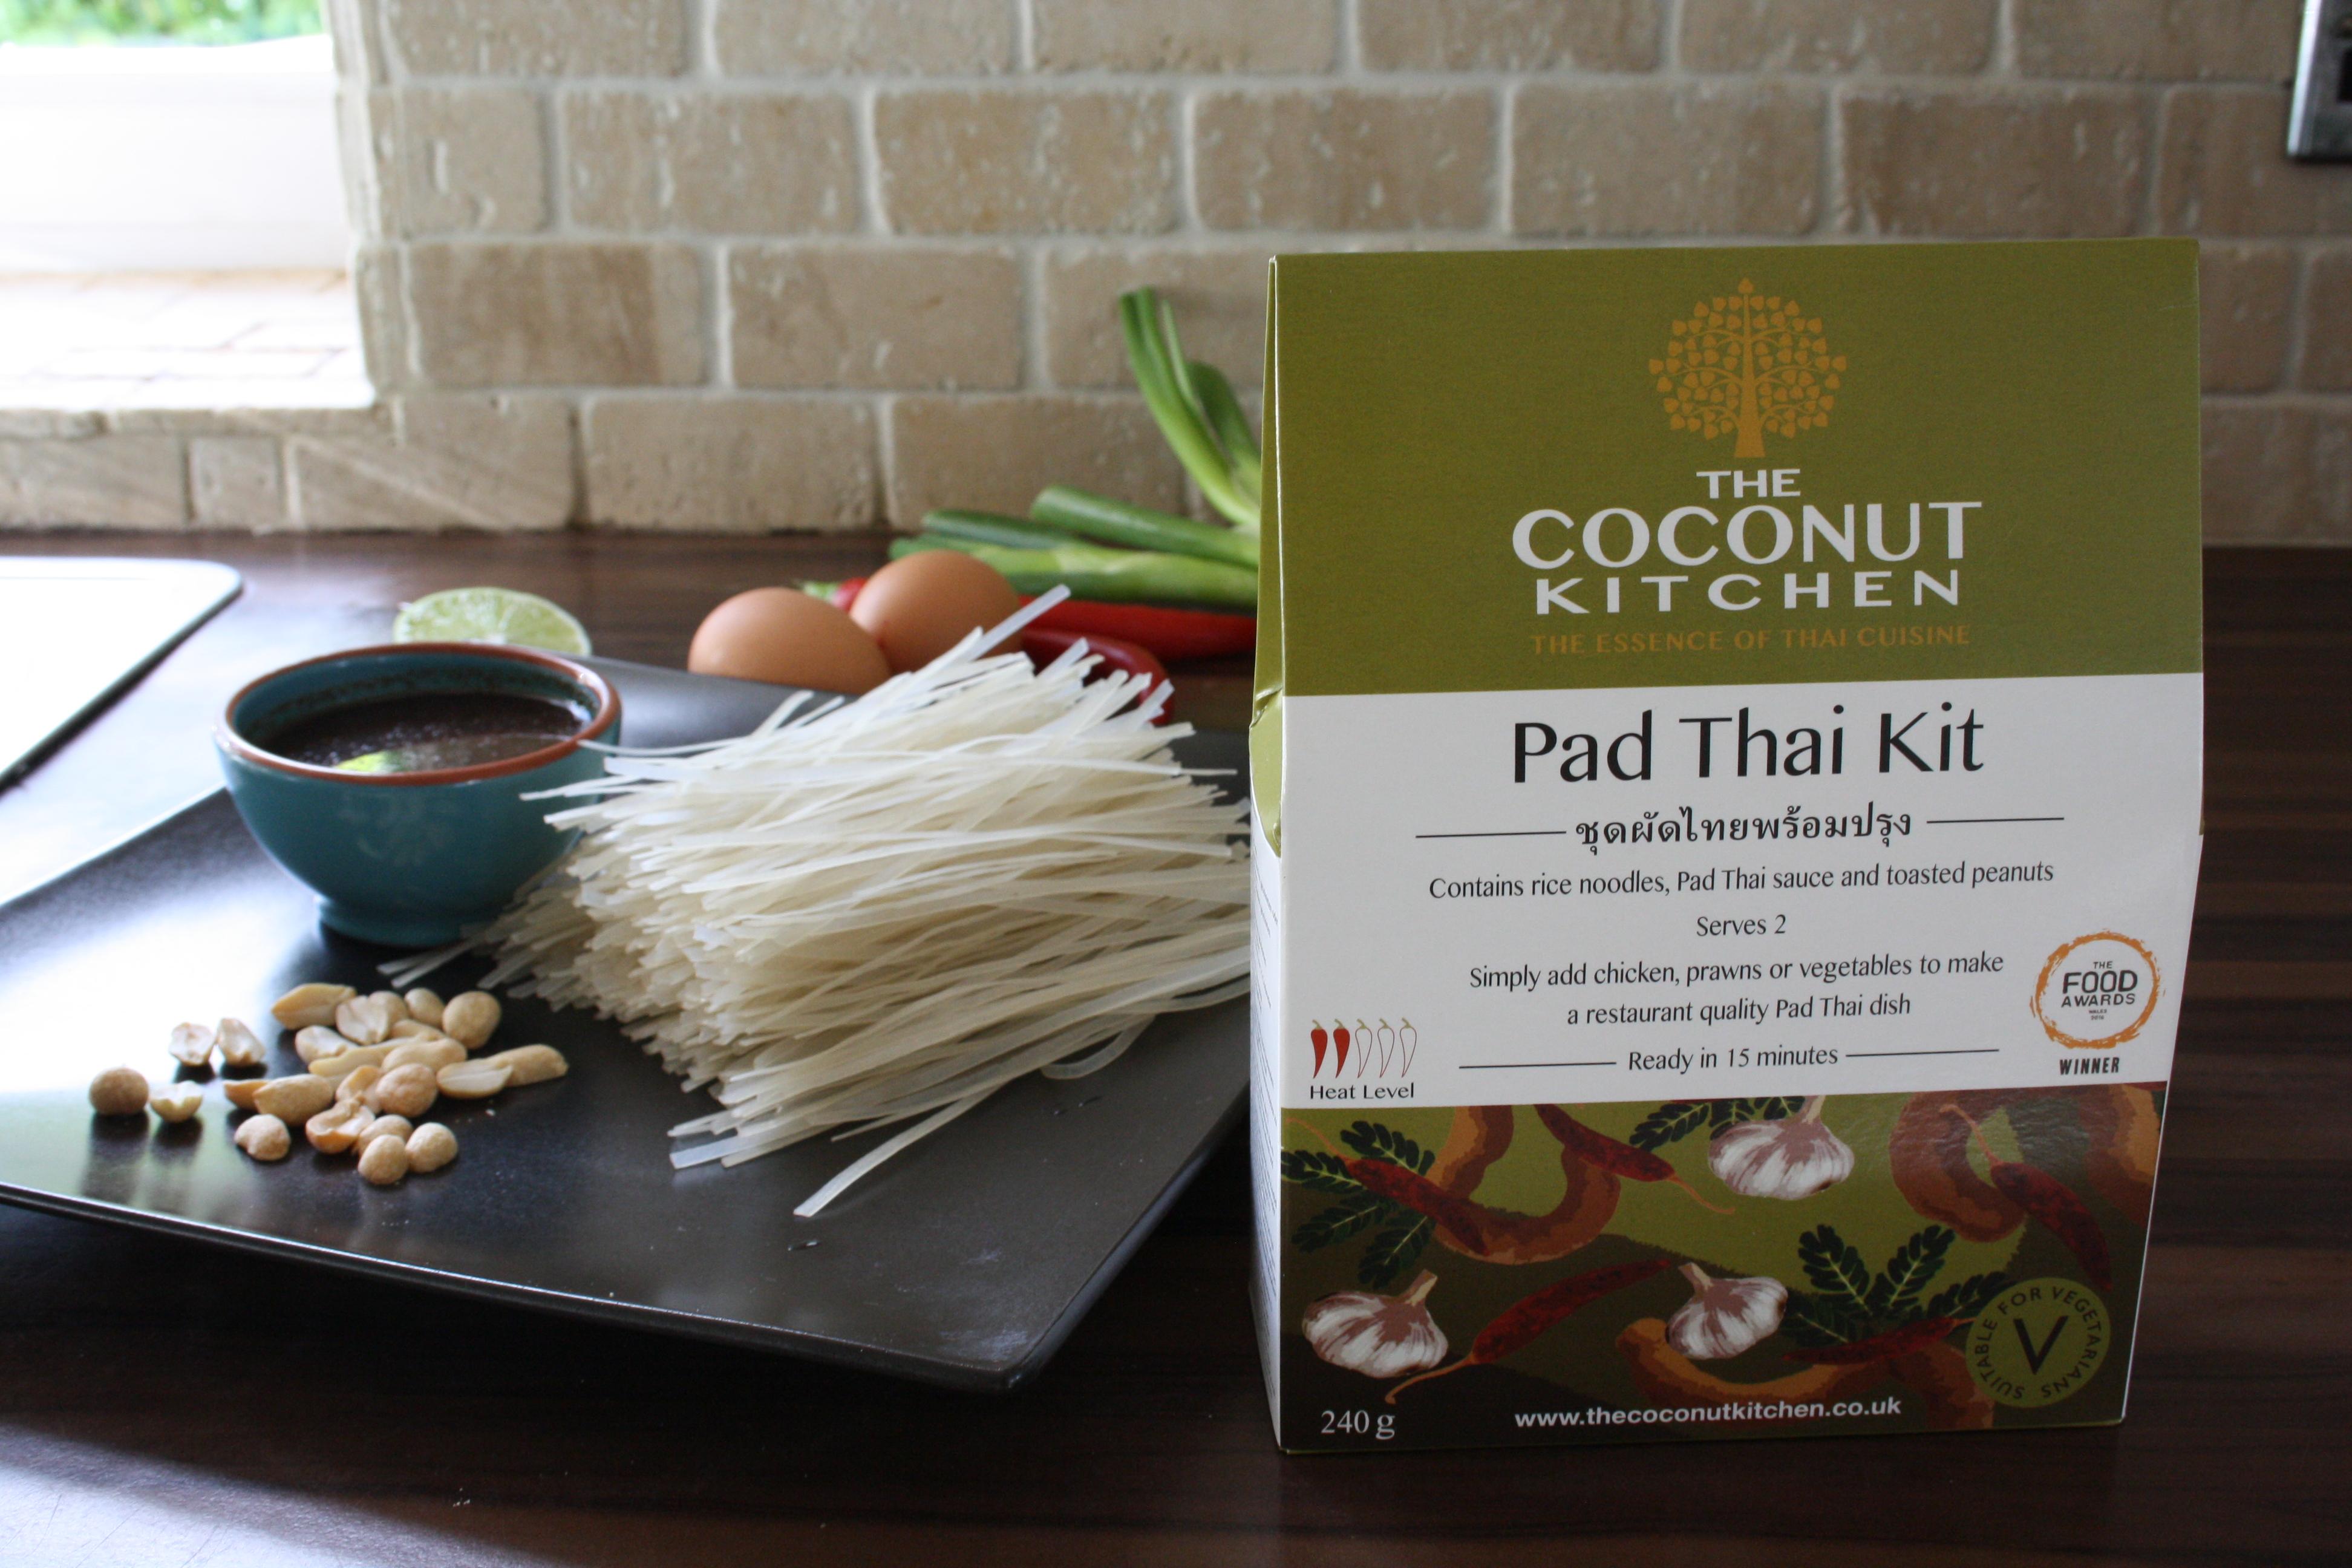 Pad thai kit the coconut kitchen pad thai recipe meal kit coconut milk recipesthai cookbook coconut milk coconut forumfinder Image collections